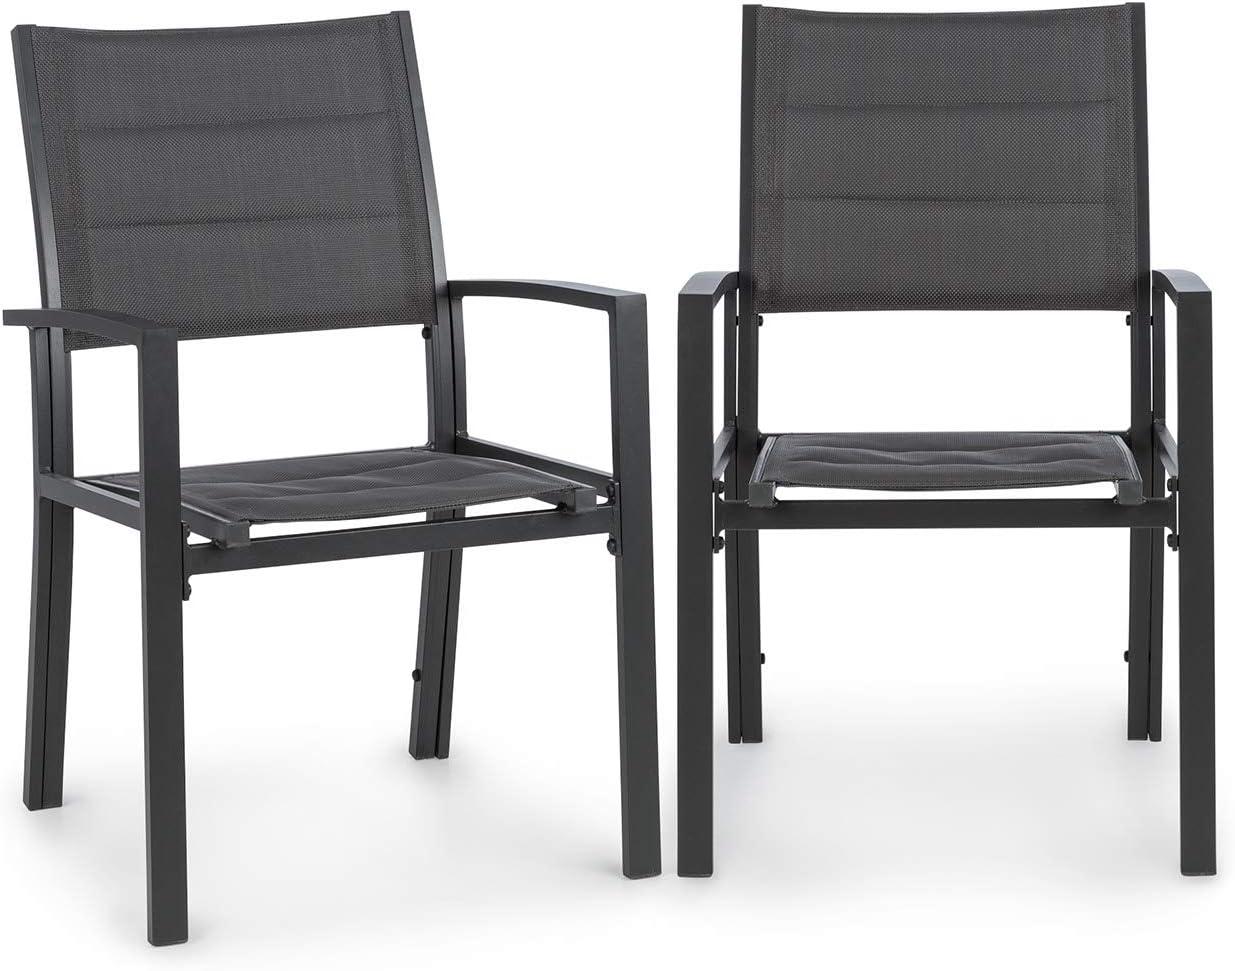 blumfeldt Torremolinos sillas de Exteriores - 2 Unidades, Estructura de Aluminio, ComfortMesh, Asiento de 40 x 43 cm, Hidrófugo, Acolchado ClassicComfort, Gris Oscuro